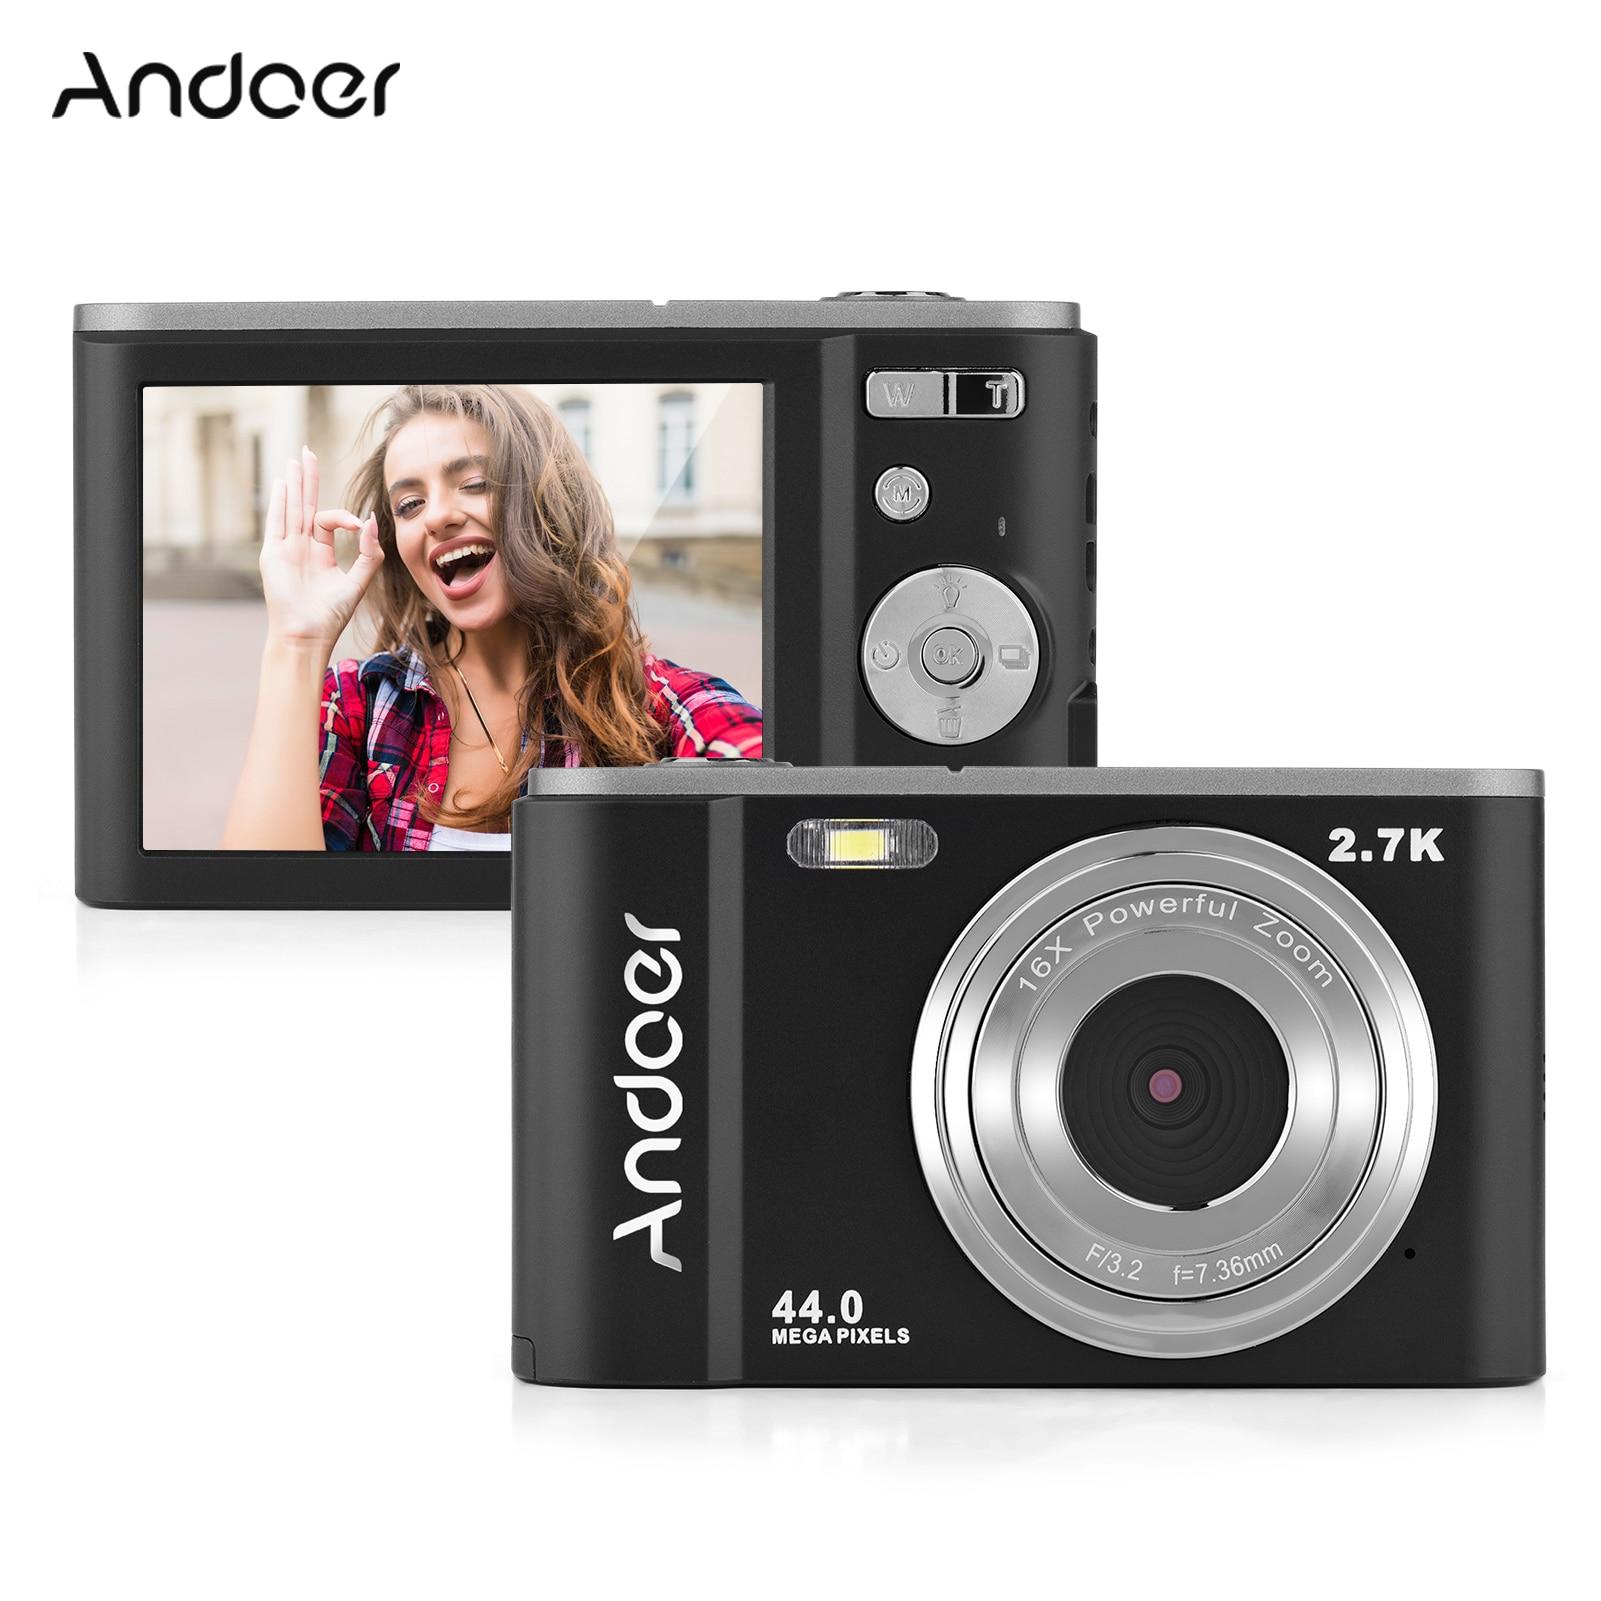 Andoer-كاميرا رقمية صغيرة 44 ميجابكسل ، 2.7K ، 2.88 بوصة ، شاشة IPS ، تقريب 16X ، كشف الوجه ، 2 قطعة ، بطارية مدمجة ، حزام يدوي ، حقيبة حمل